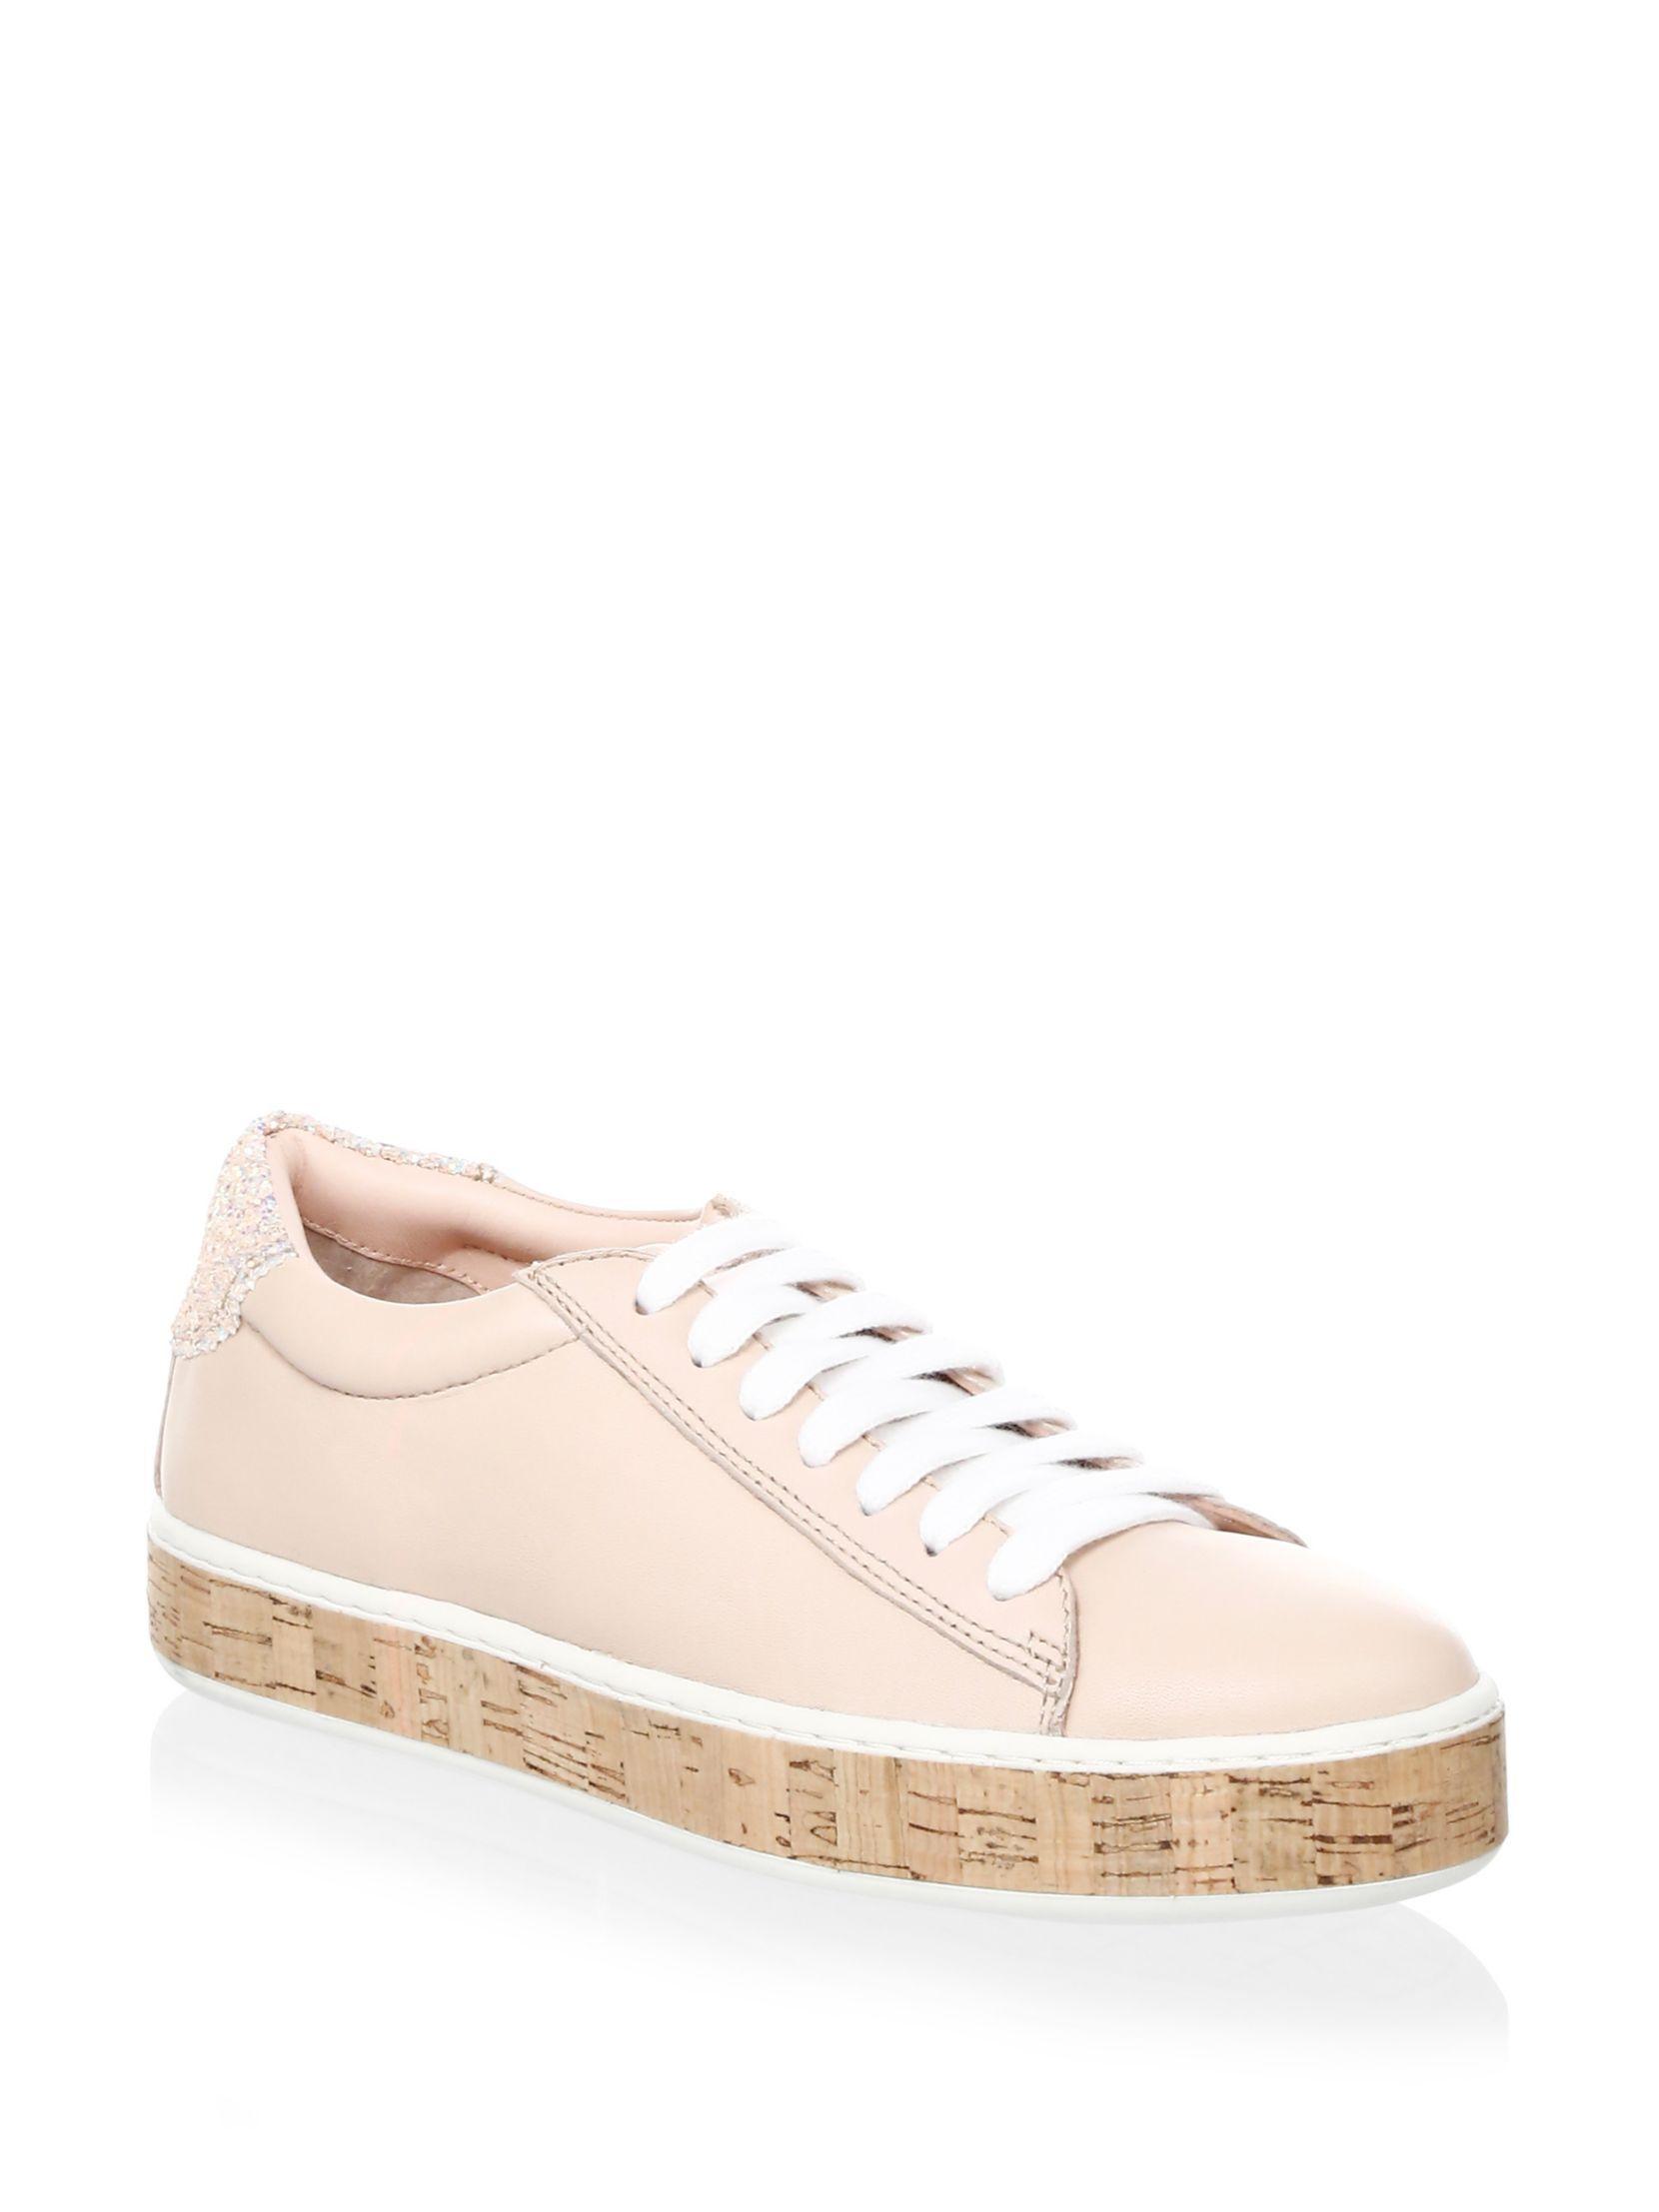 Kate Spade New York Amy Leather Platform Sneakers xOtLgp